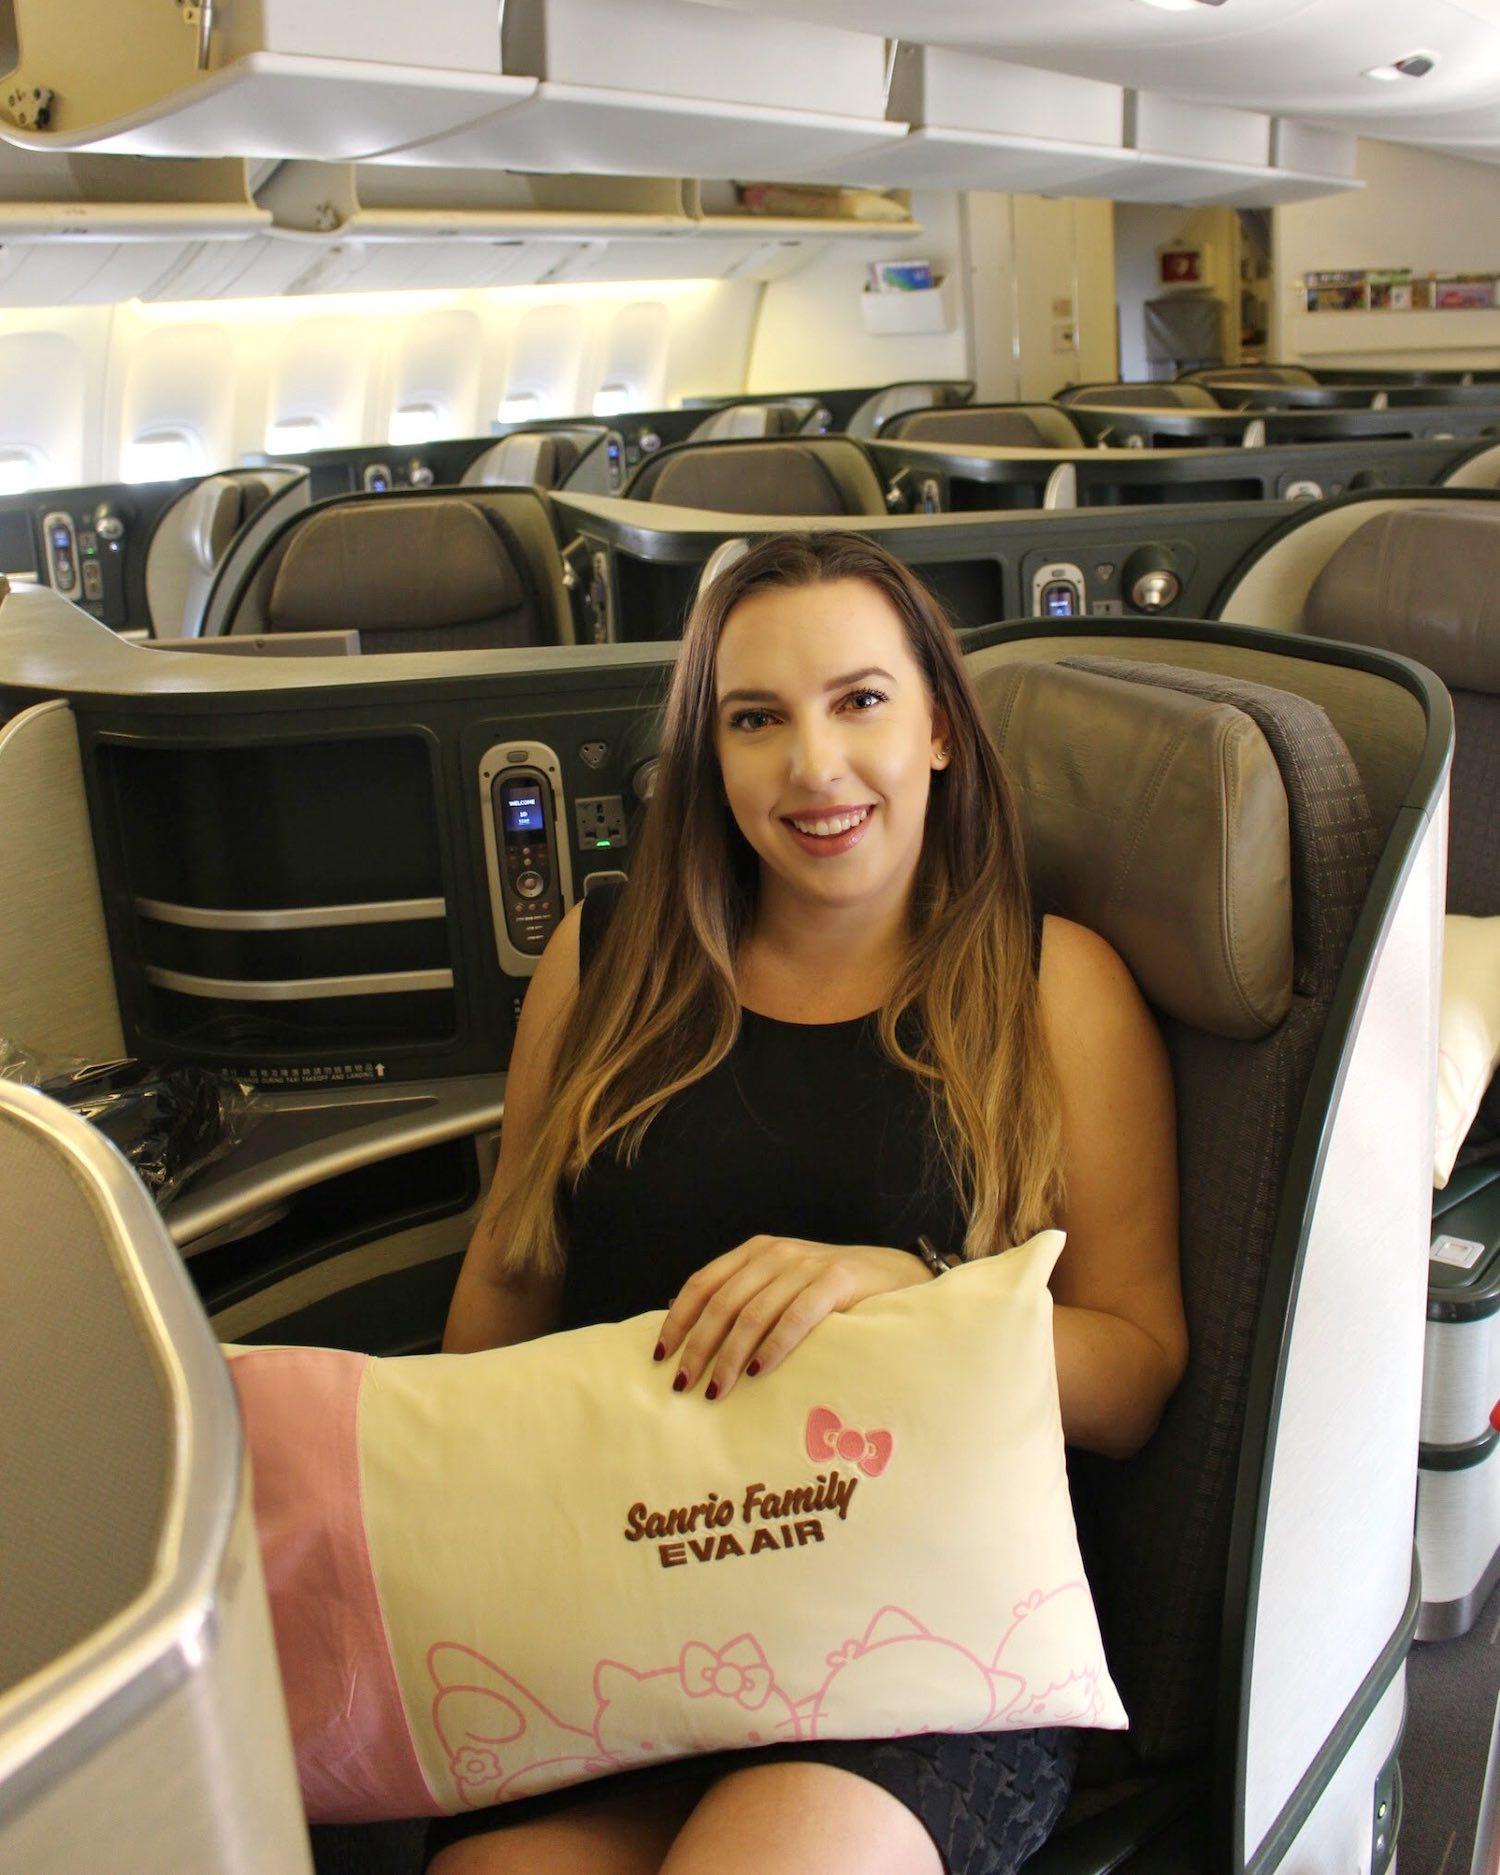 EVA Air Hello Kitty Jet Business Class